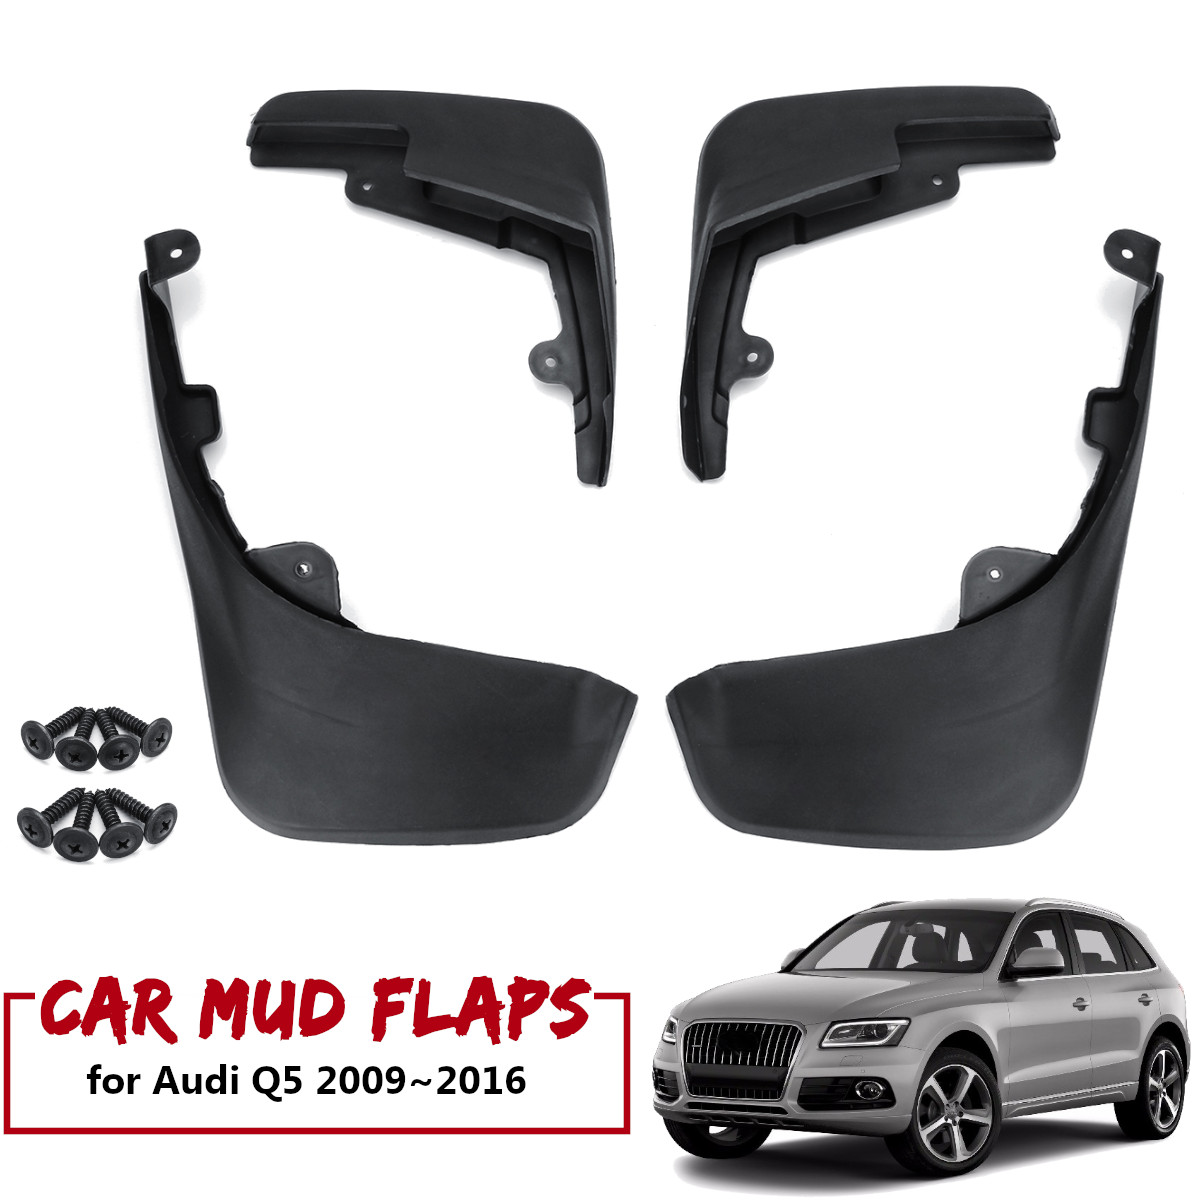 Mudflaps Mud Flap For Molded Audi Q5 2009-2016 Splash Guards Mudguards 4pcs